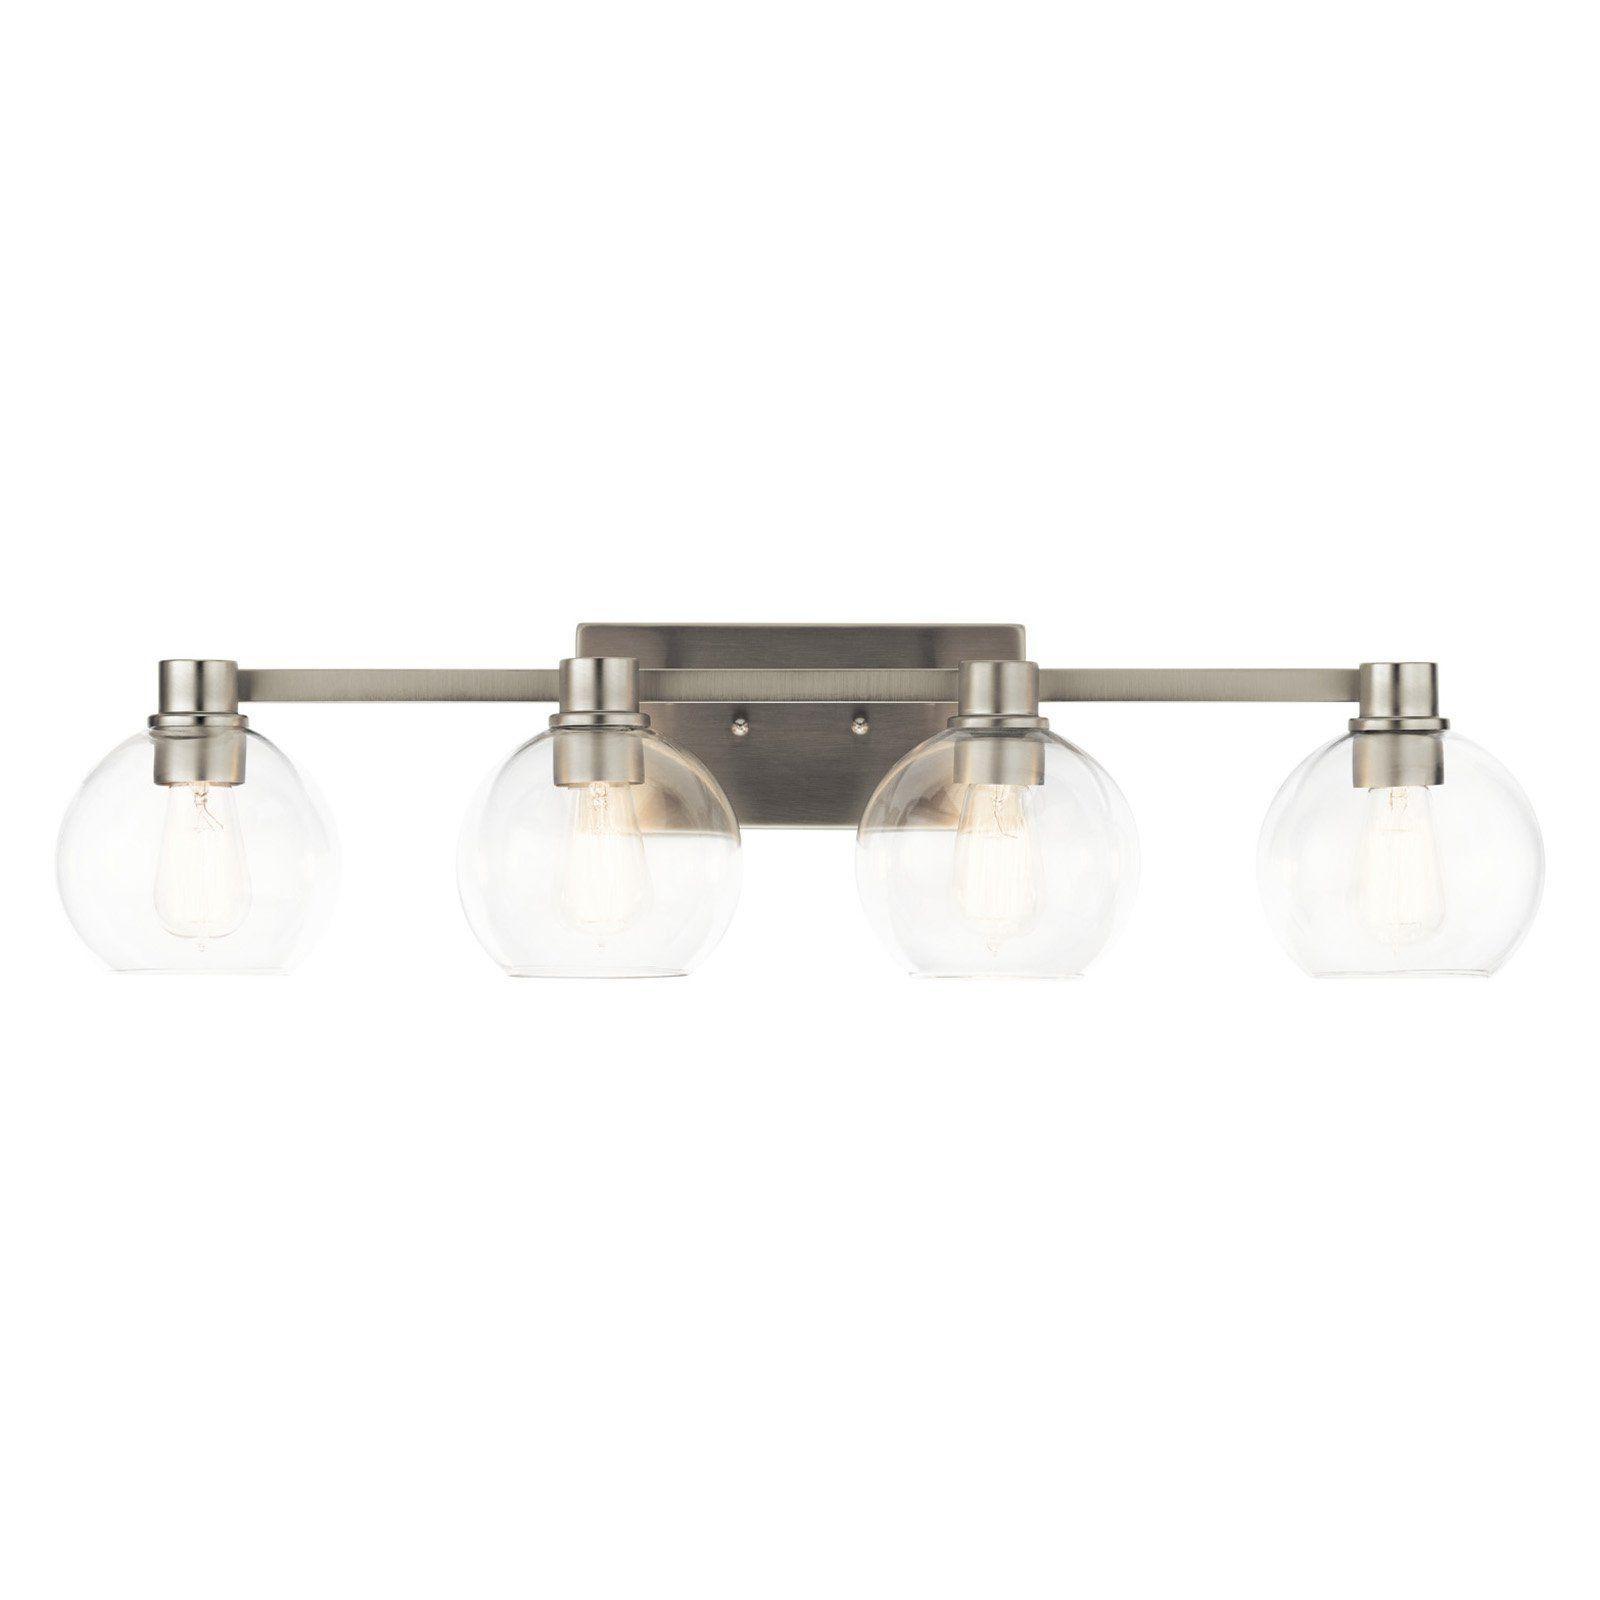 Kichler Harmony 45895 Bathroom Vanity Light In 2020 Vanity